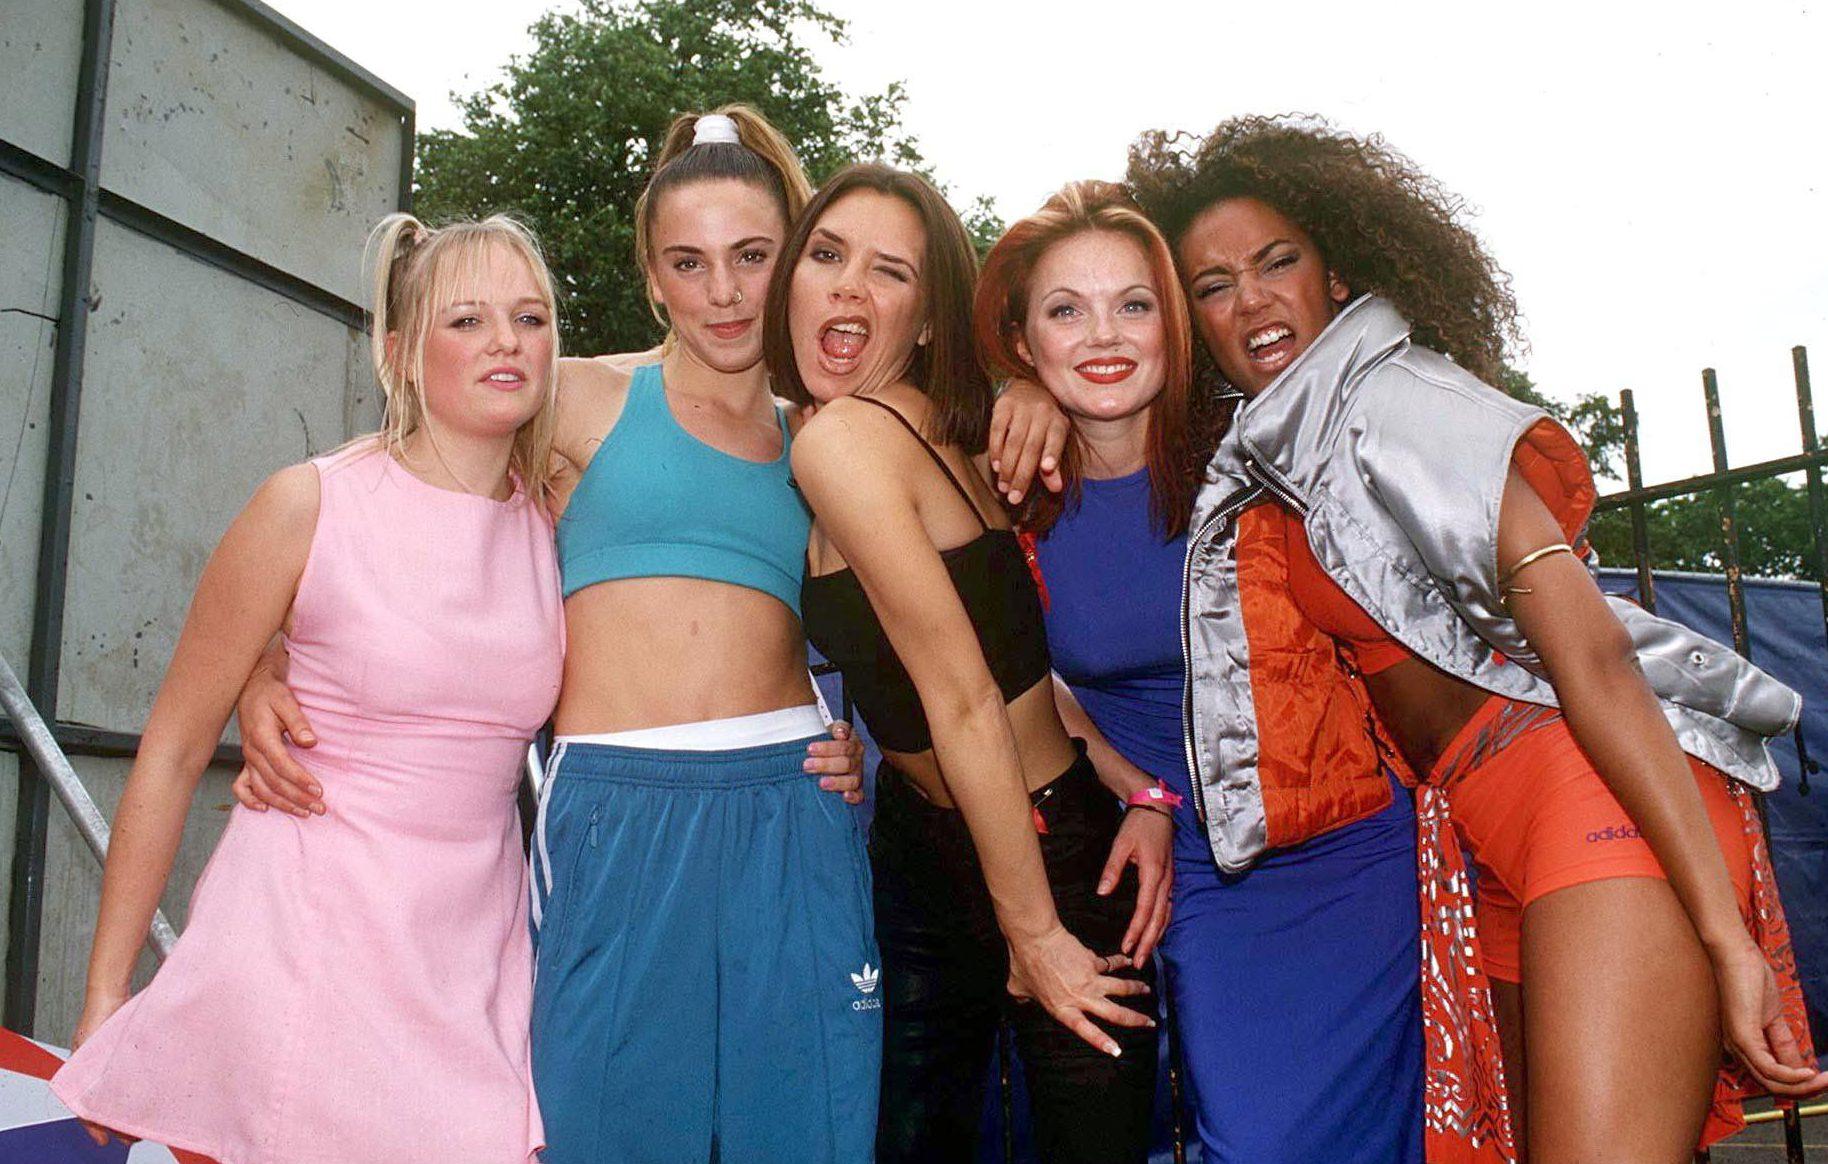 Mandatory Credit: Photo by Stephen Sweet/REX/Shutterstock (261364i) The Spice Girls - Emma Bunton, Mel C, Victoria Adams, Geri Halliwell and Mel B Capital Radio Summer Jam, Clapham Common, London, Britain - 1996